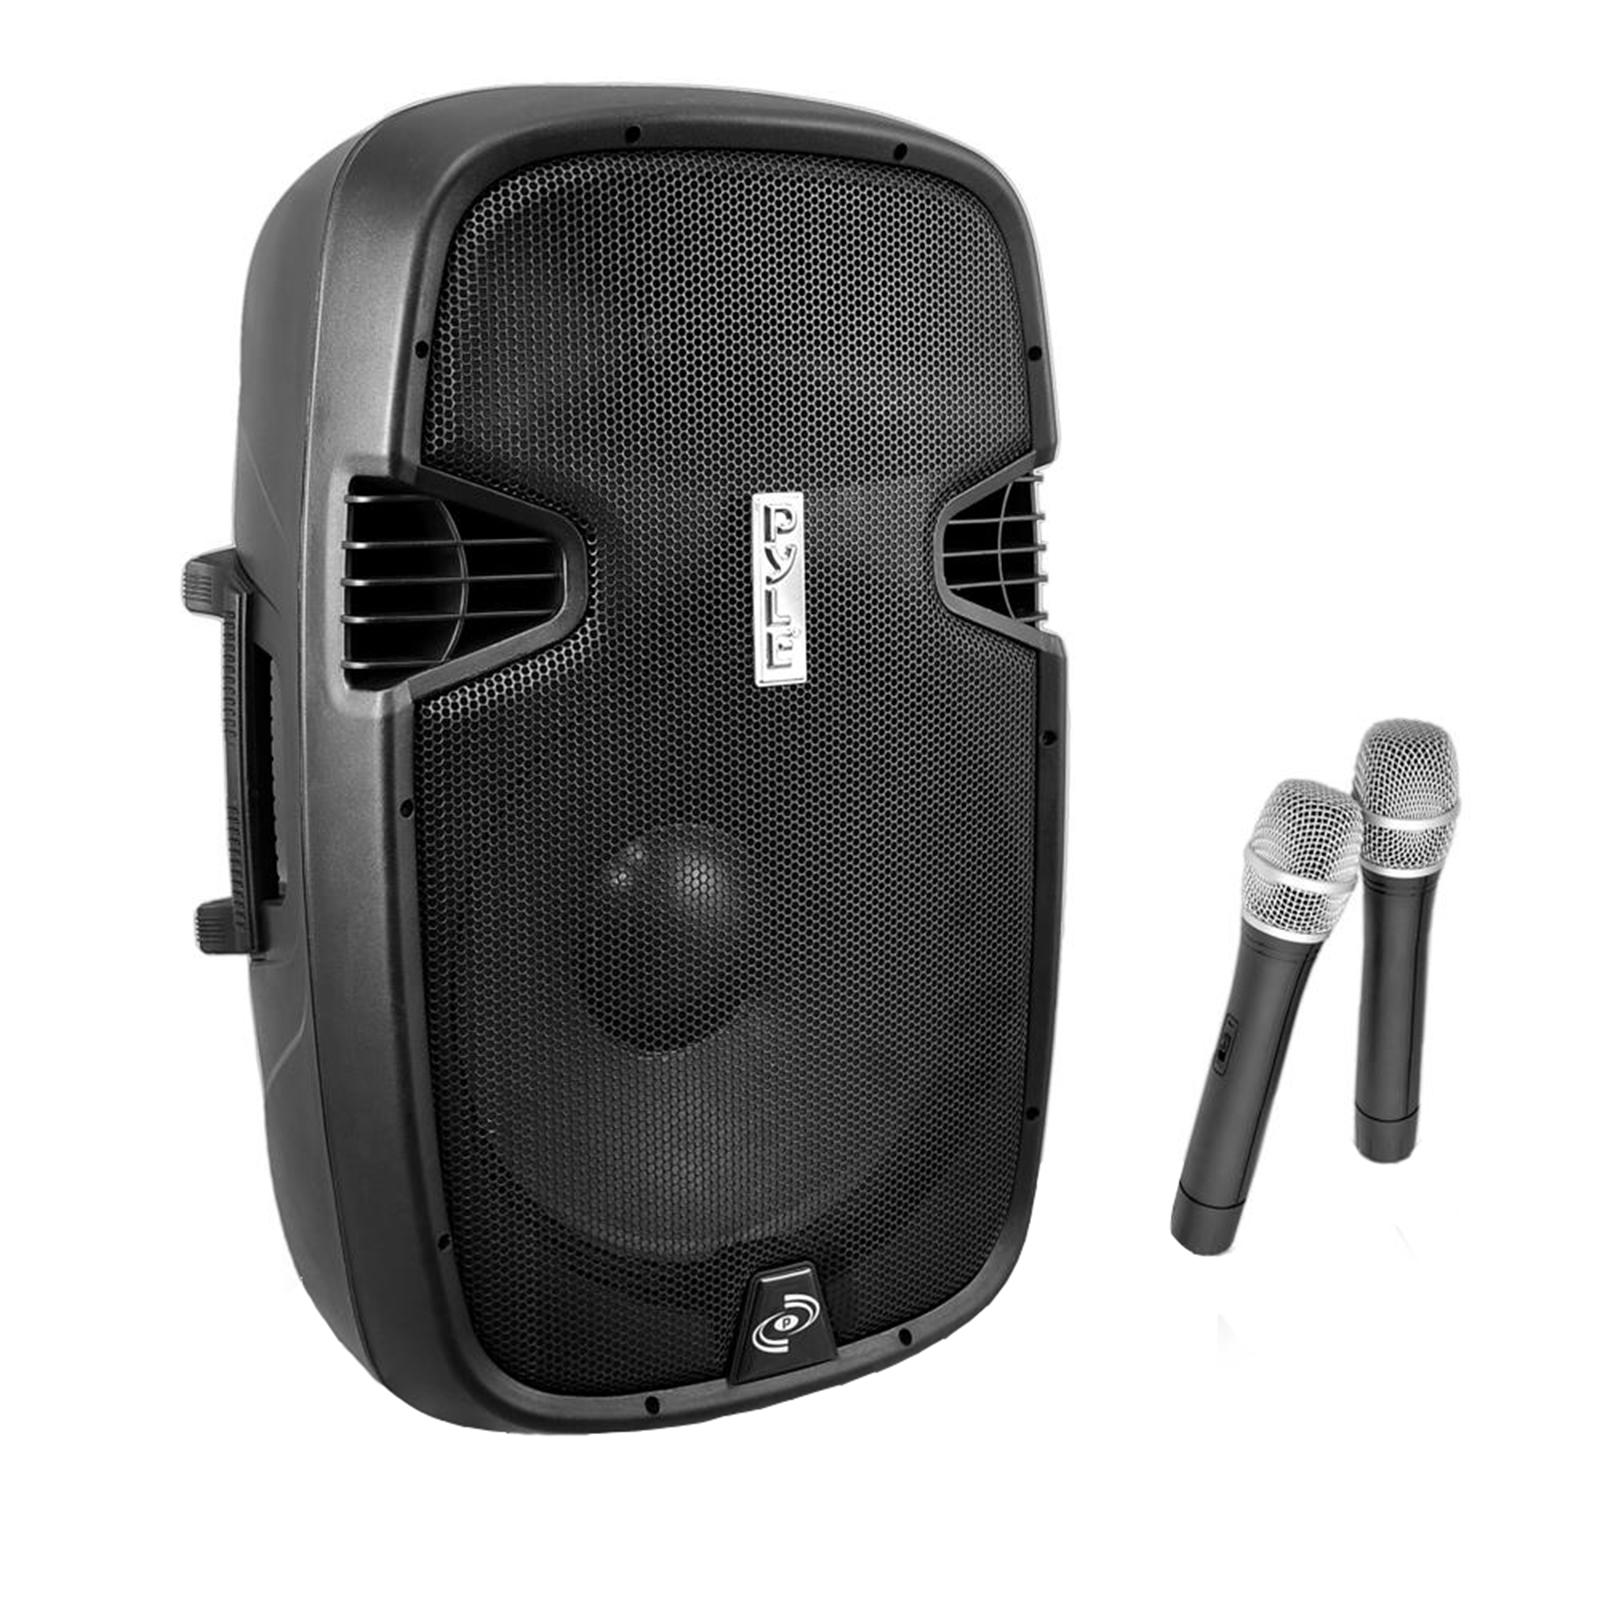 "PylePro 12"" 1000 Watt Portable Loudspeaker System - Built-in Battery, 2 Mics, FM Radio, LCD Readout, USB , SD Card Readers and BT Music streaming"